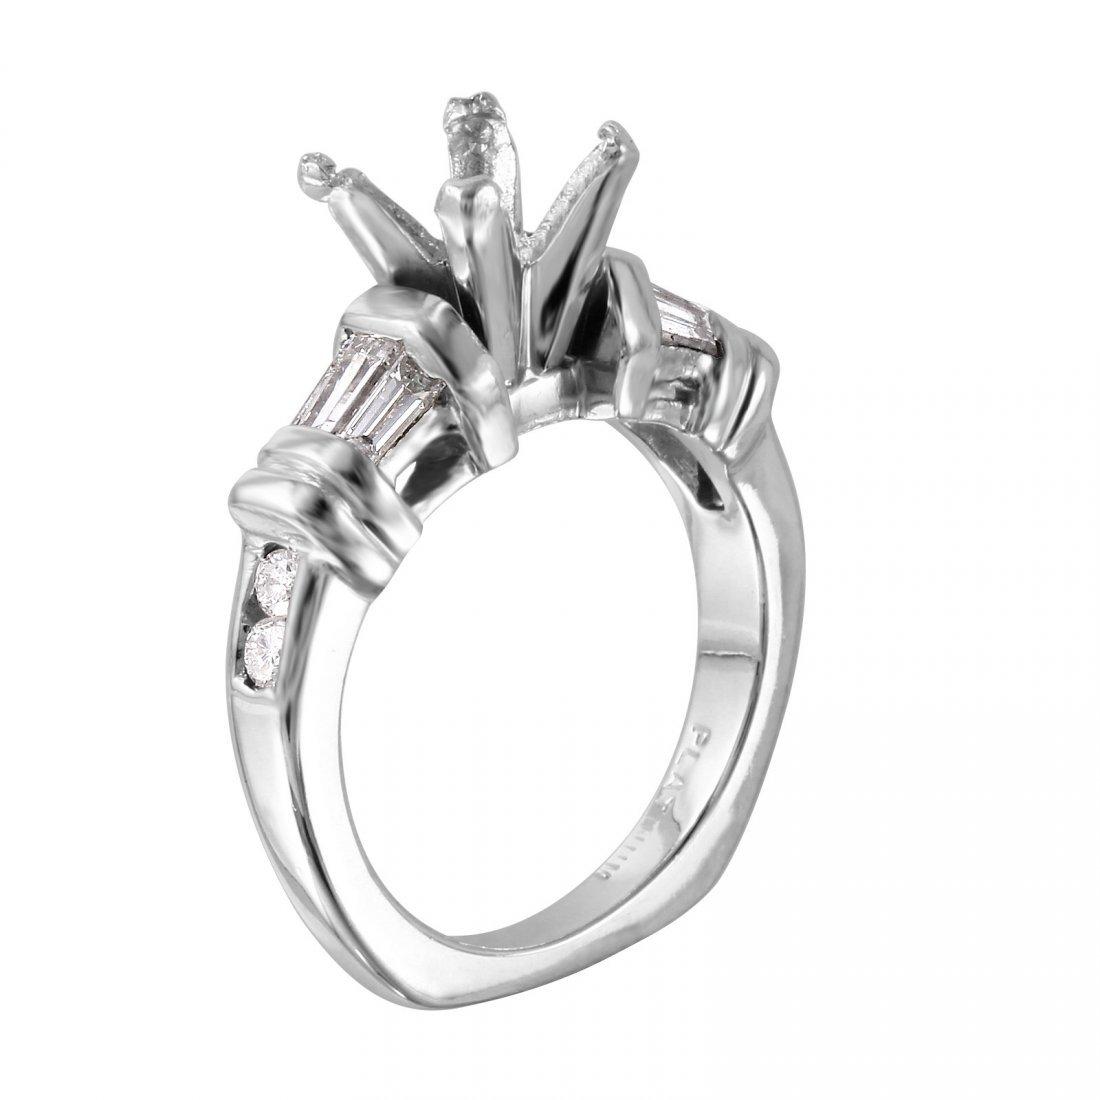 Platinum Semi-Mounting Mixed Diamond Engagement Ring - 2